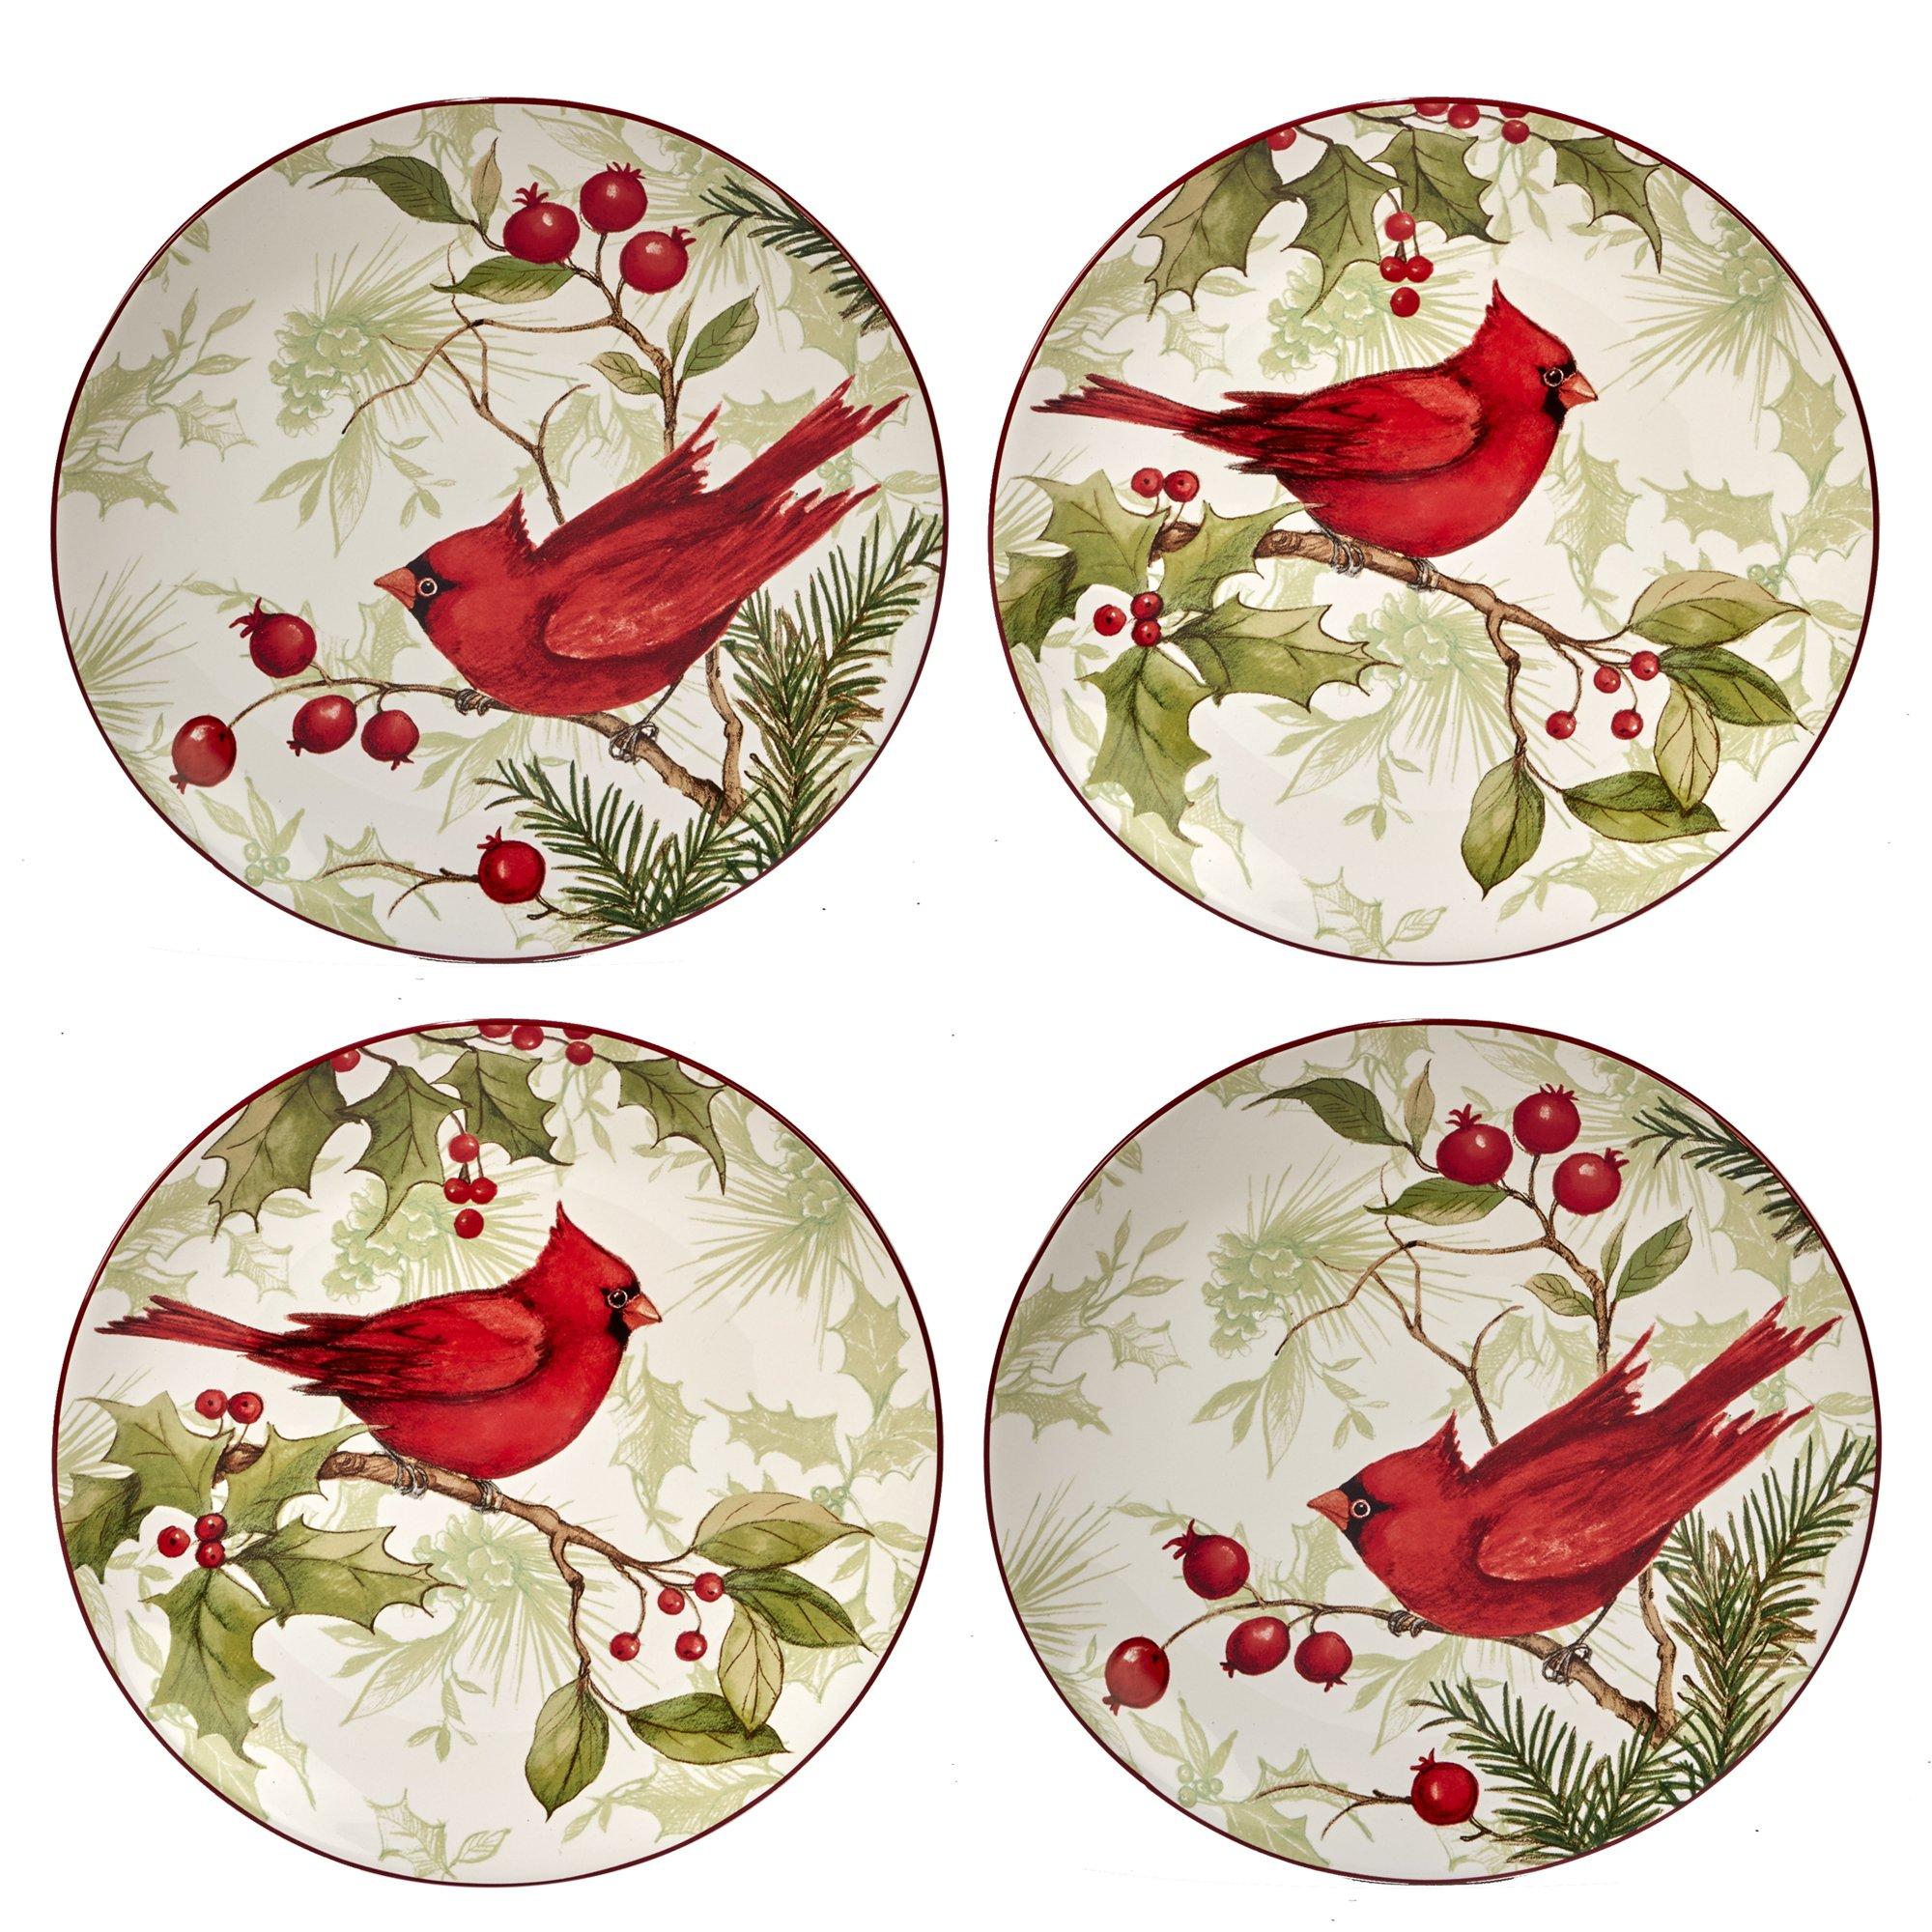 Certified International Winter Field Notes  9'' Dessert Plates, Set of 4, 2 Assorted Designs